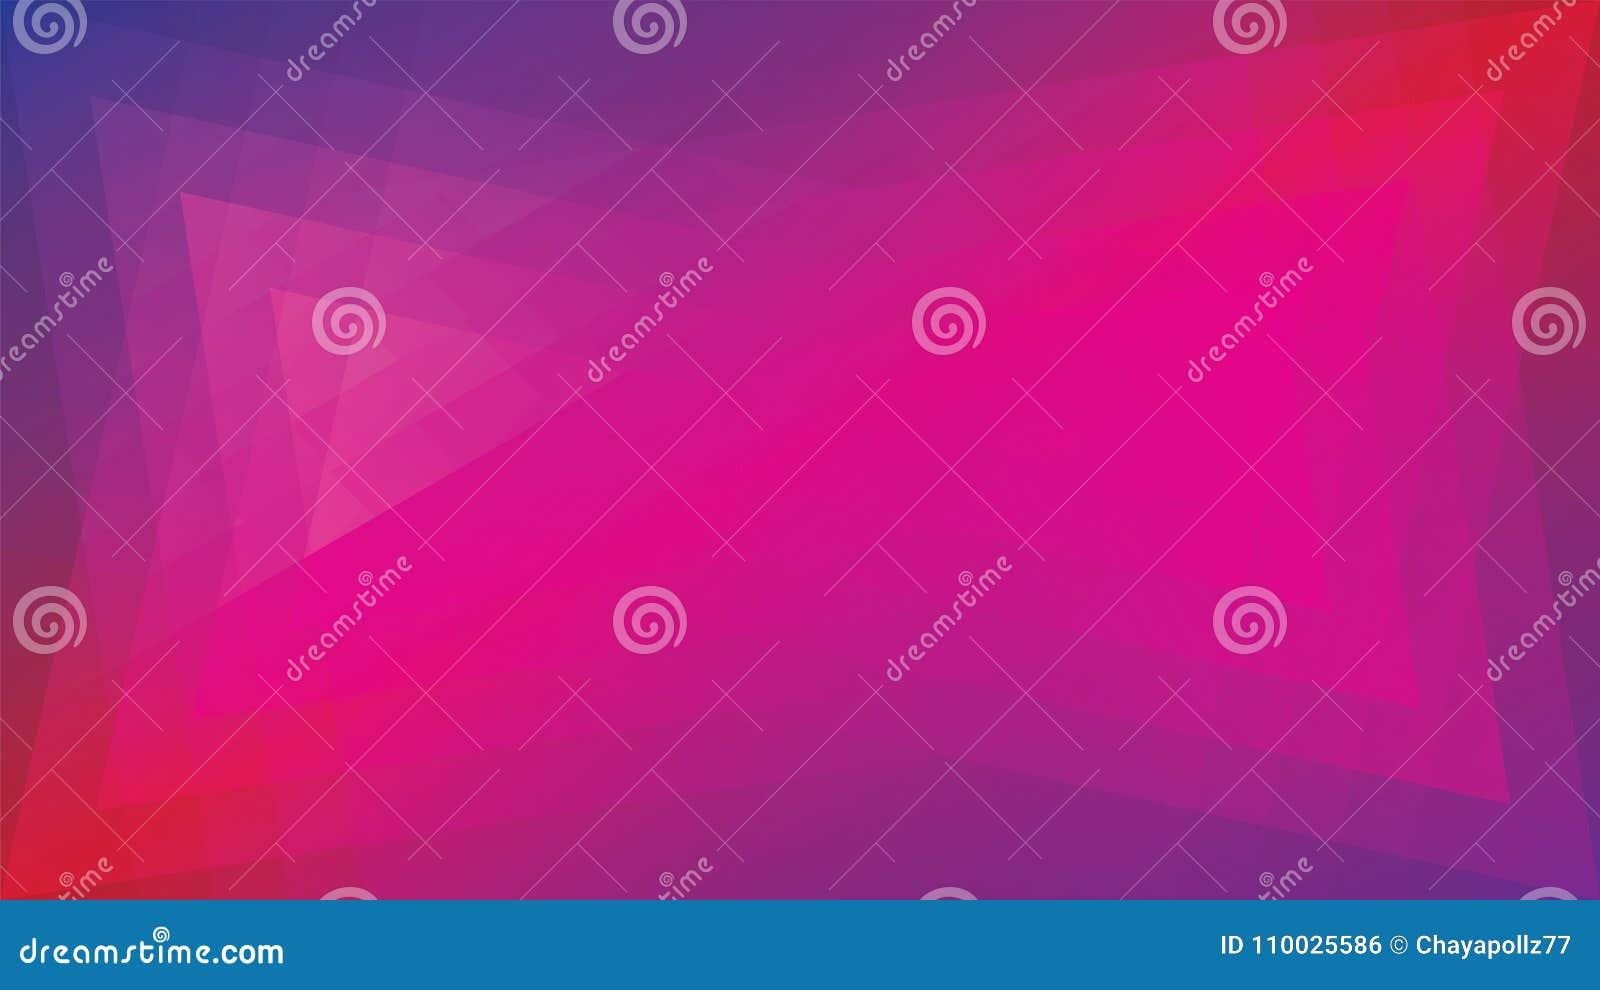 Abstracte violette, roze en rode geometrische achtergrond,